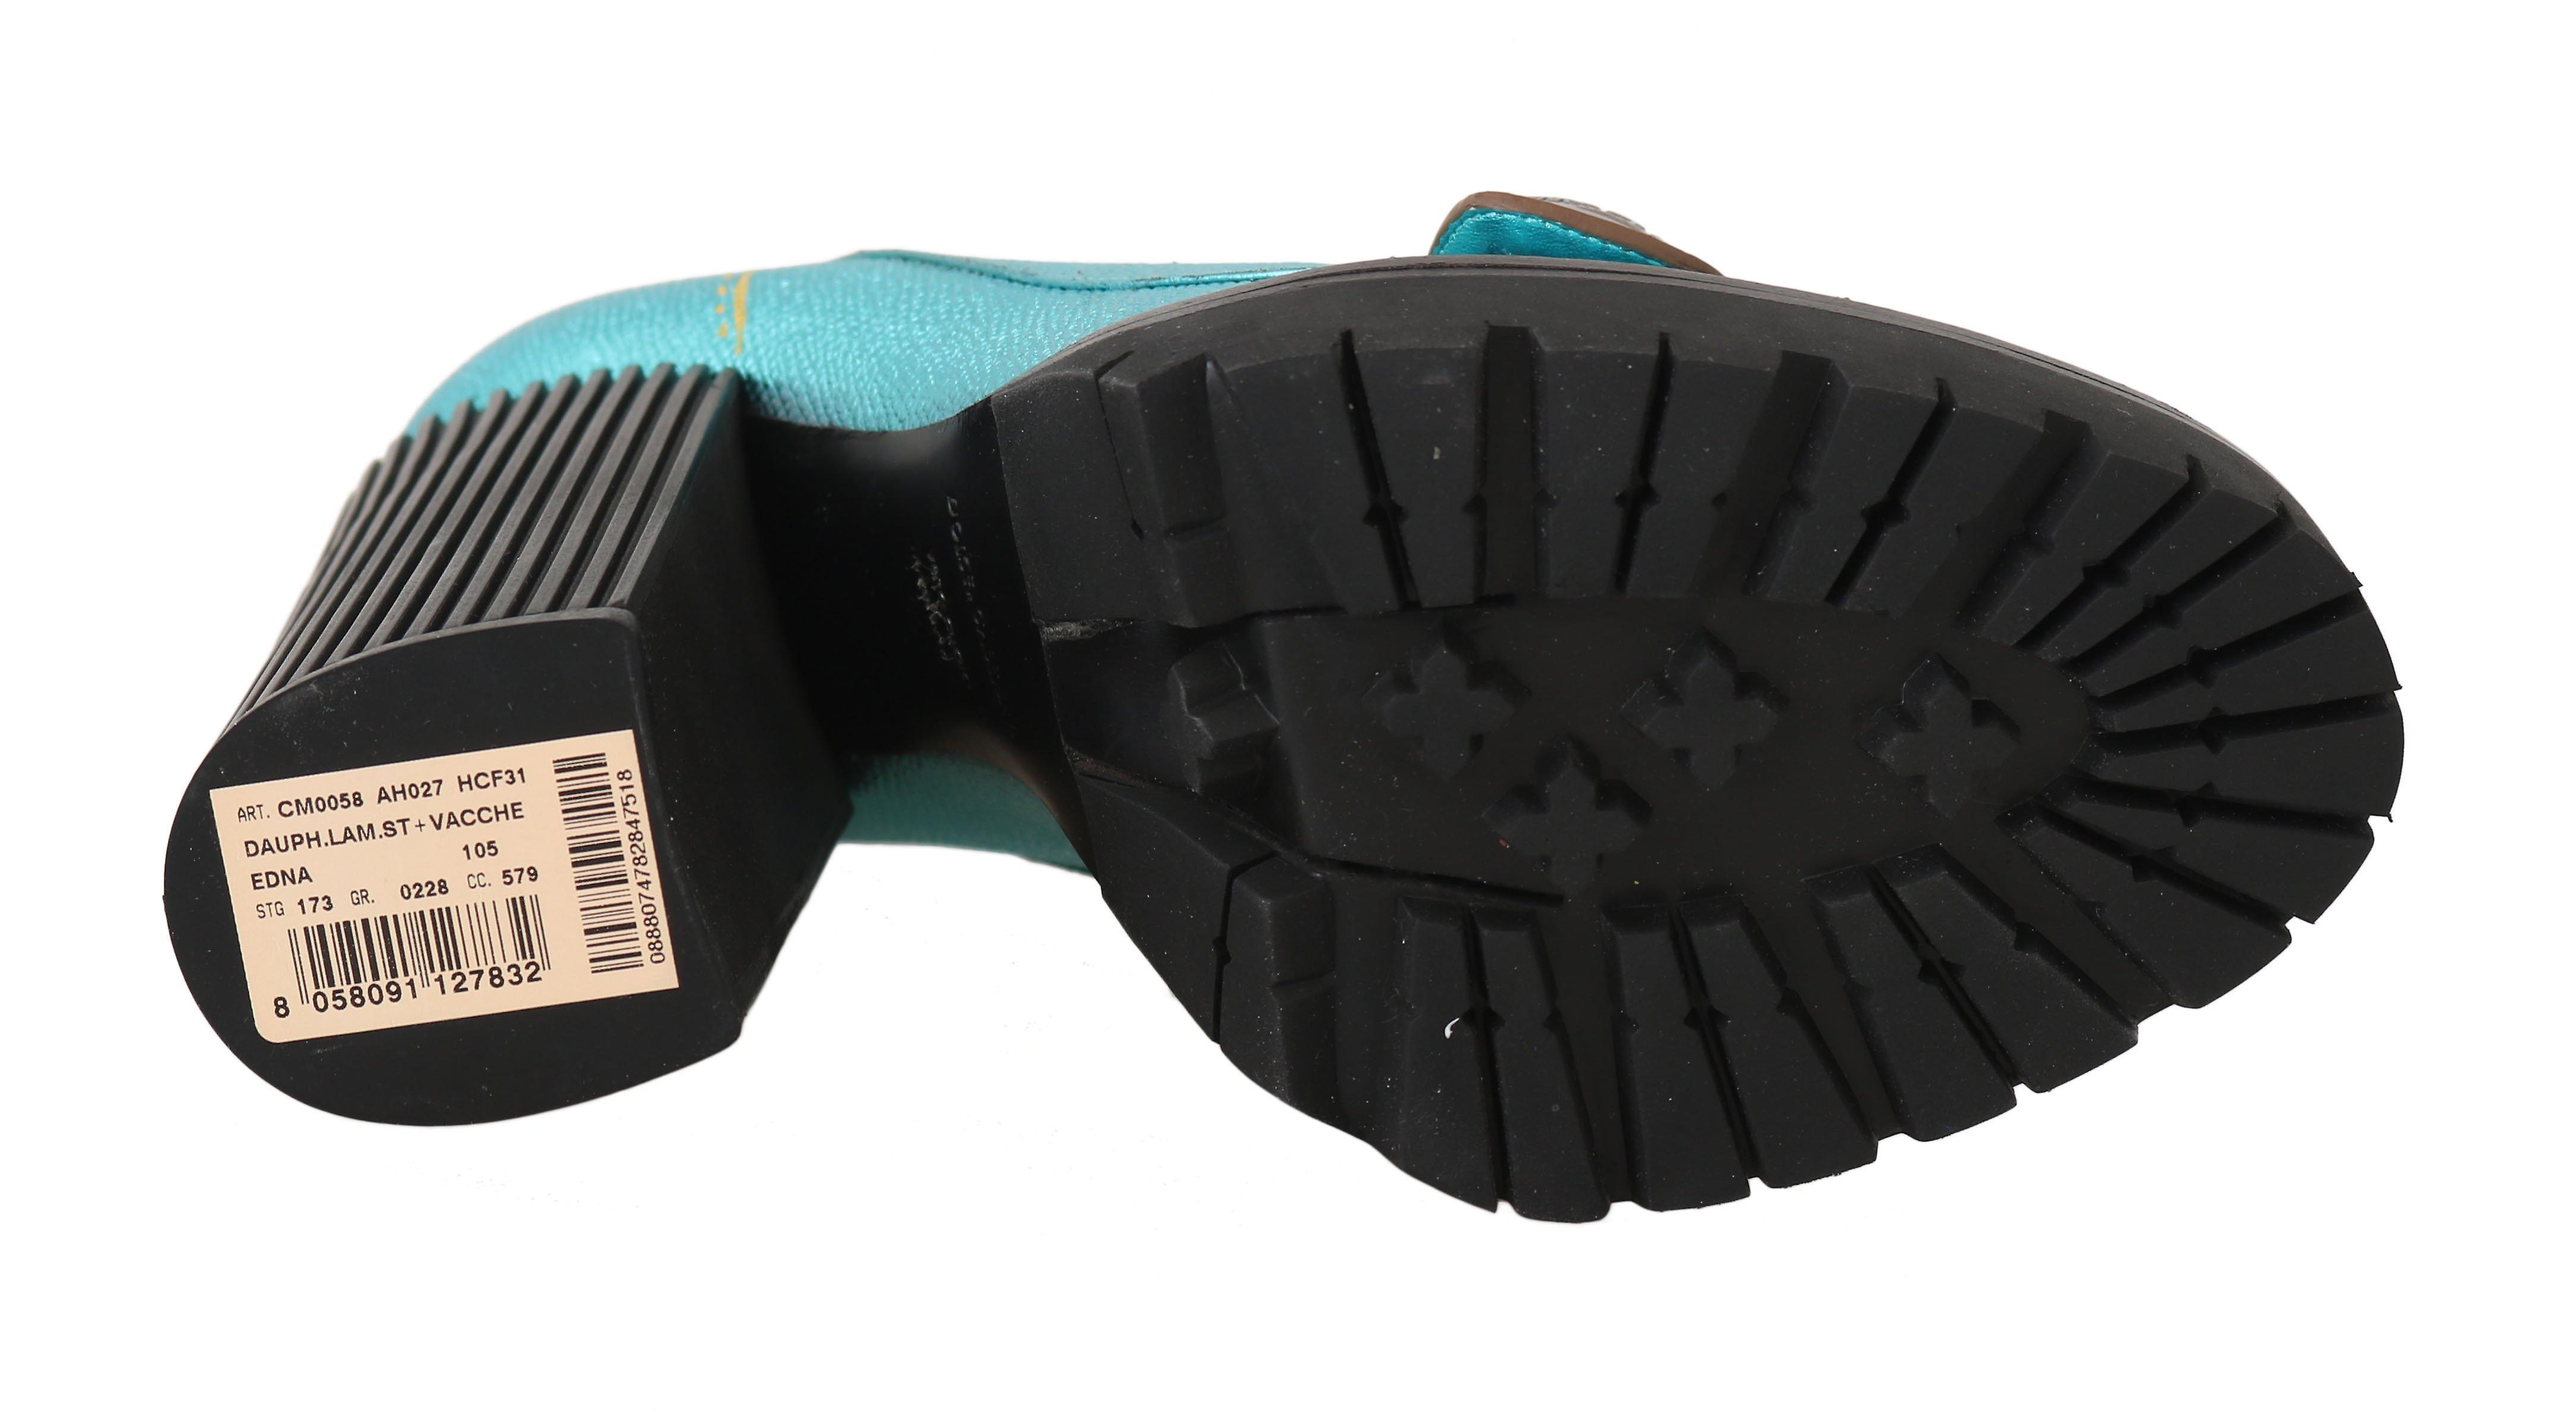 Dolce & Gabbana Leather Handpainted Heart Pumps -- La44121520